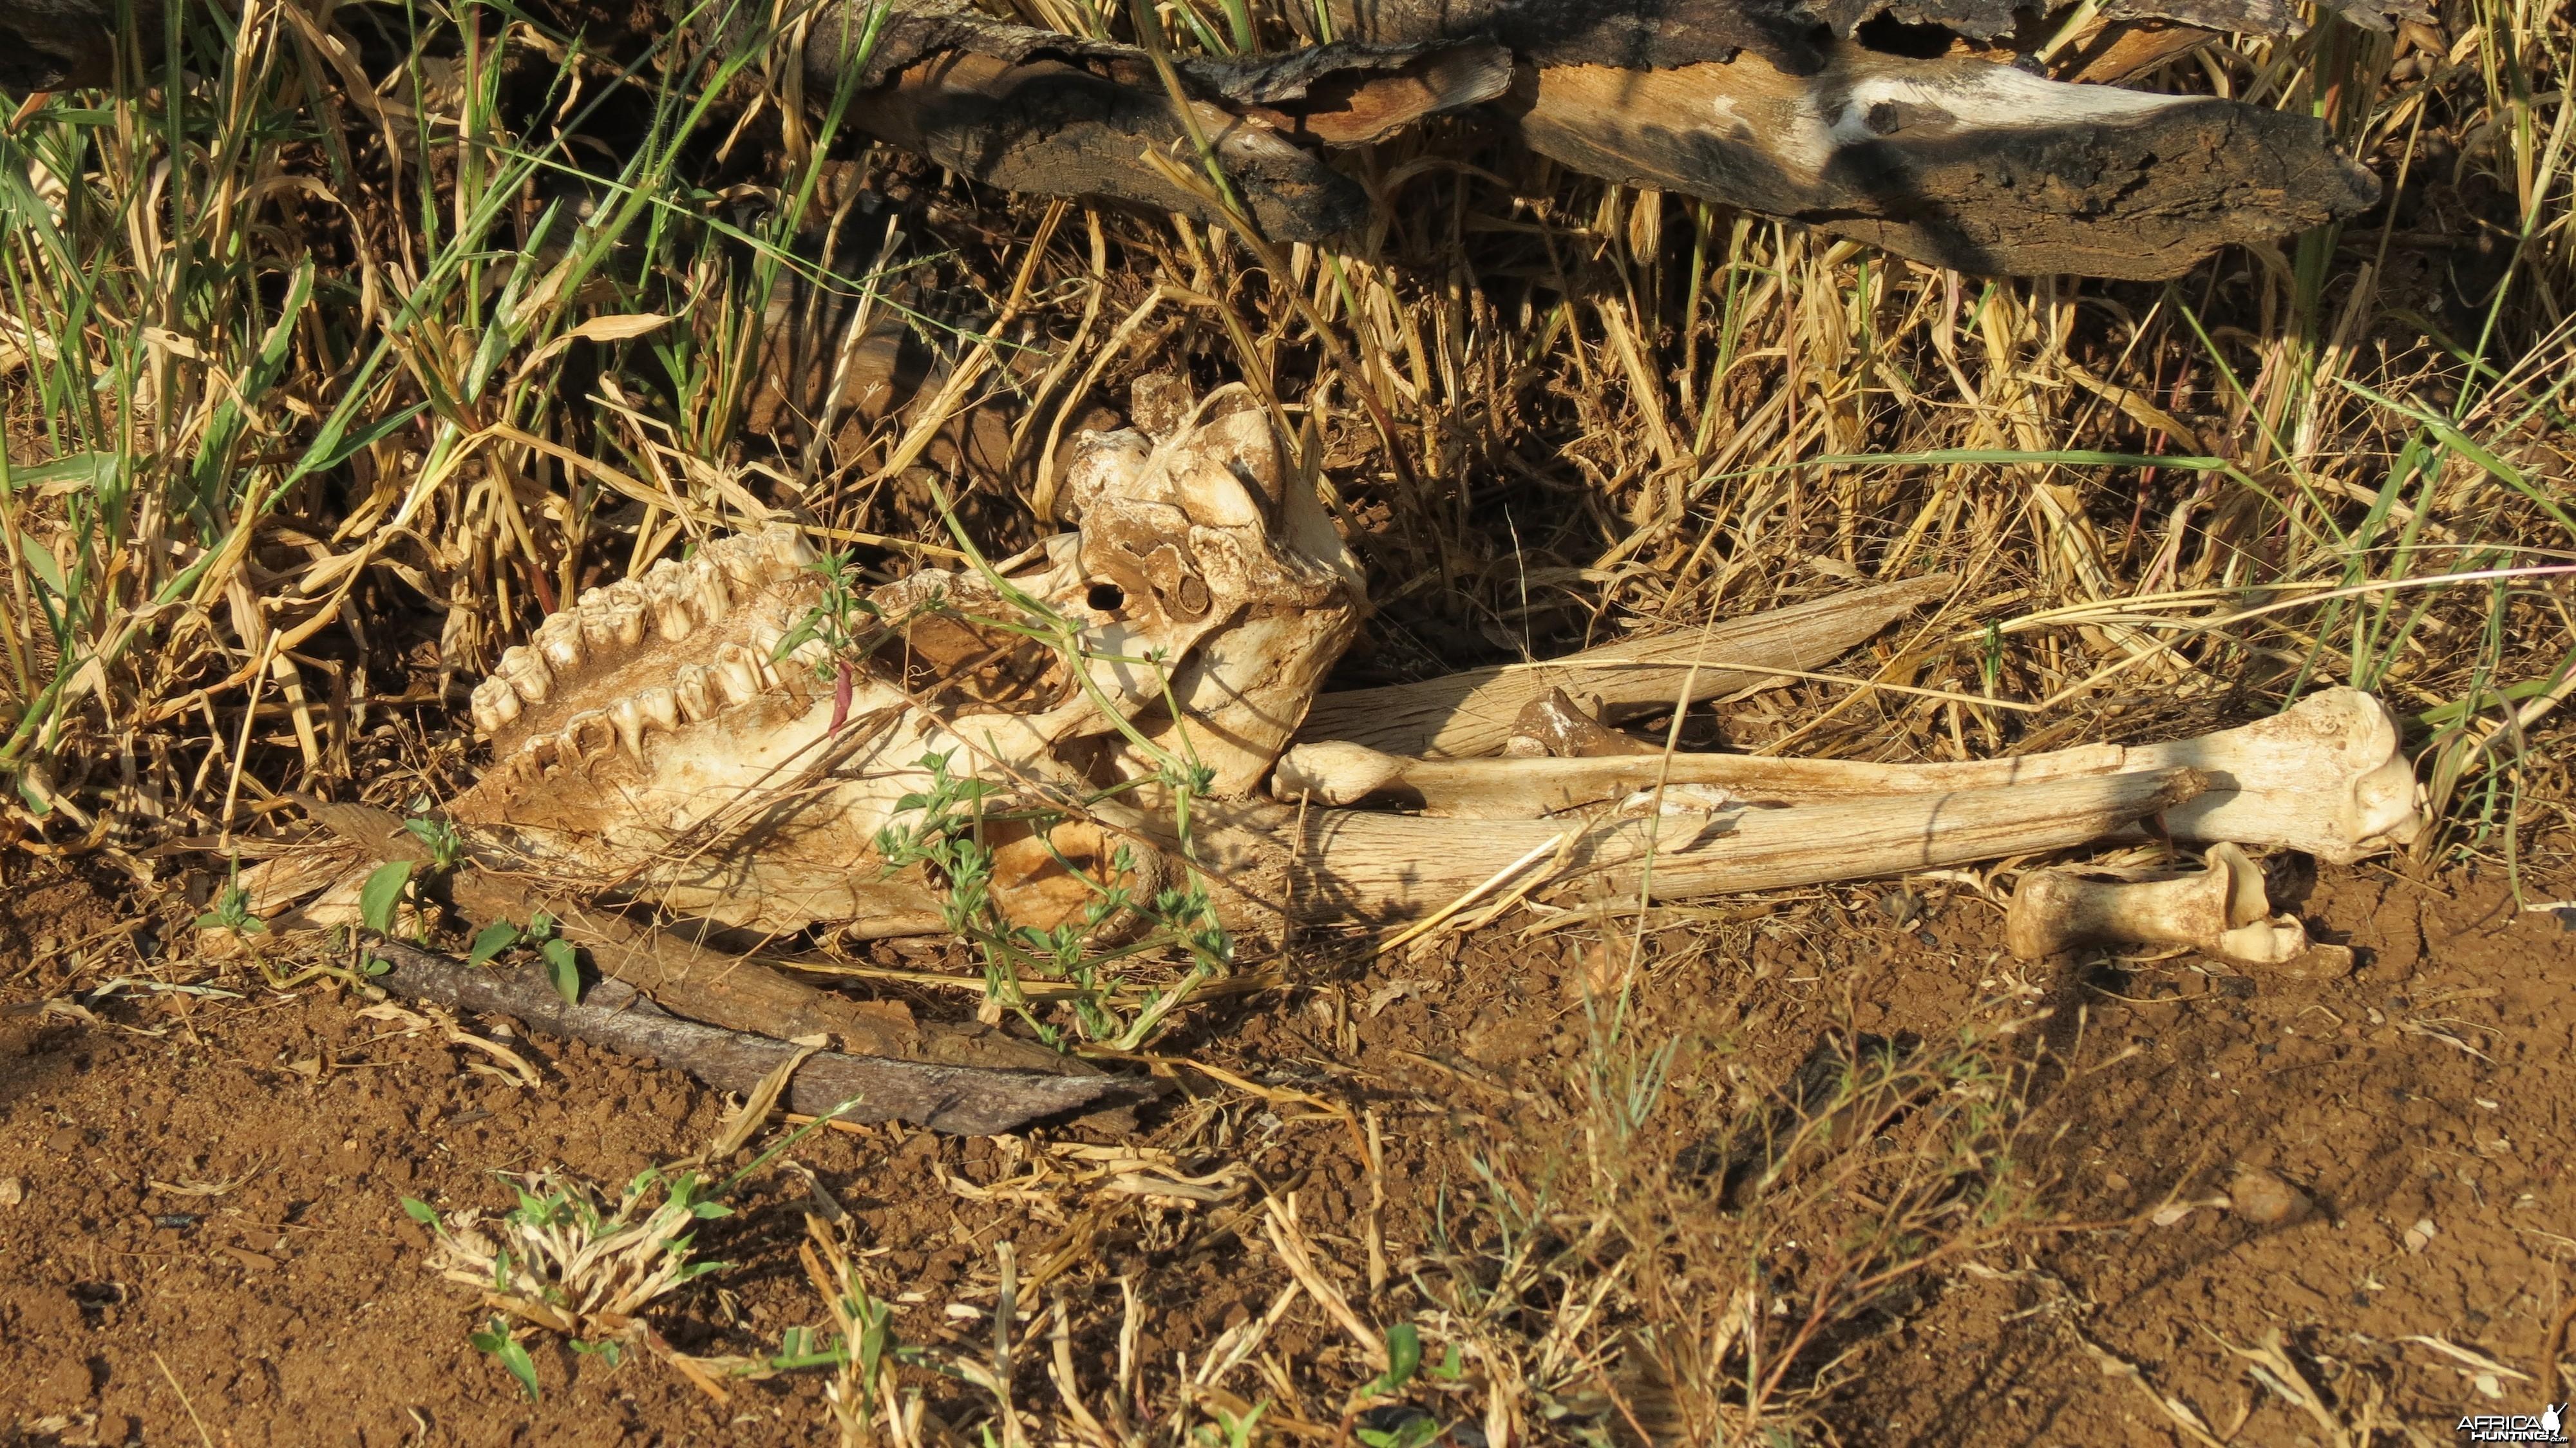 Gemsbok Carcass Namibia